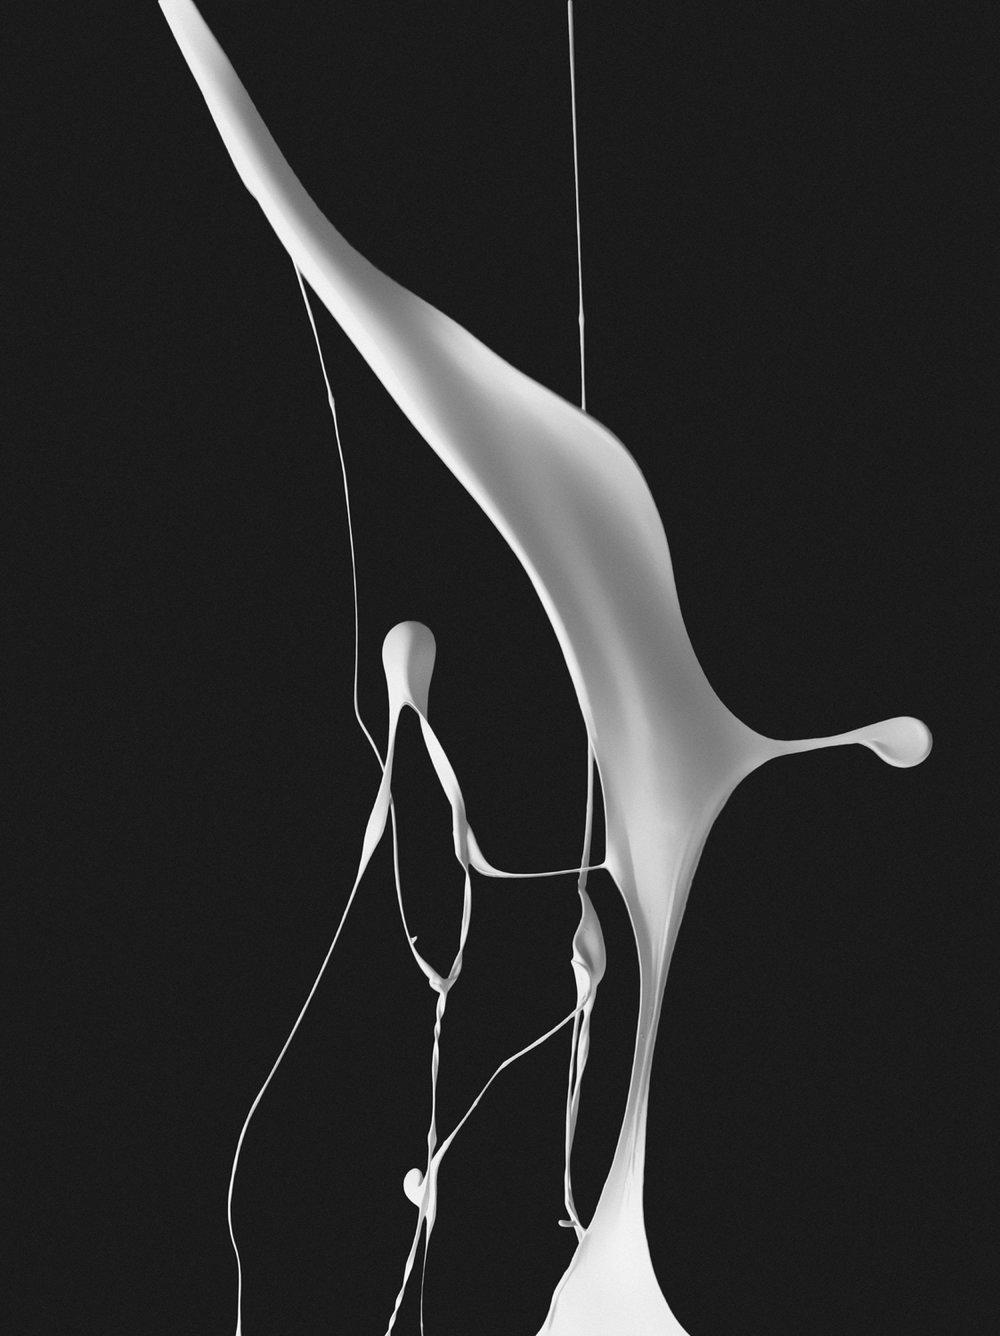 Lux-Liquid-Motion-Photography-High-Speed-Portfolio-12.jpg